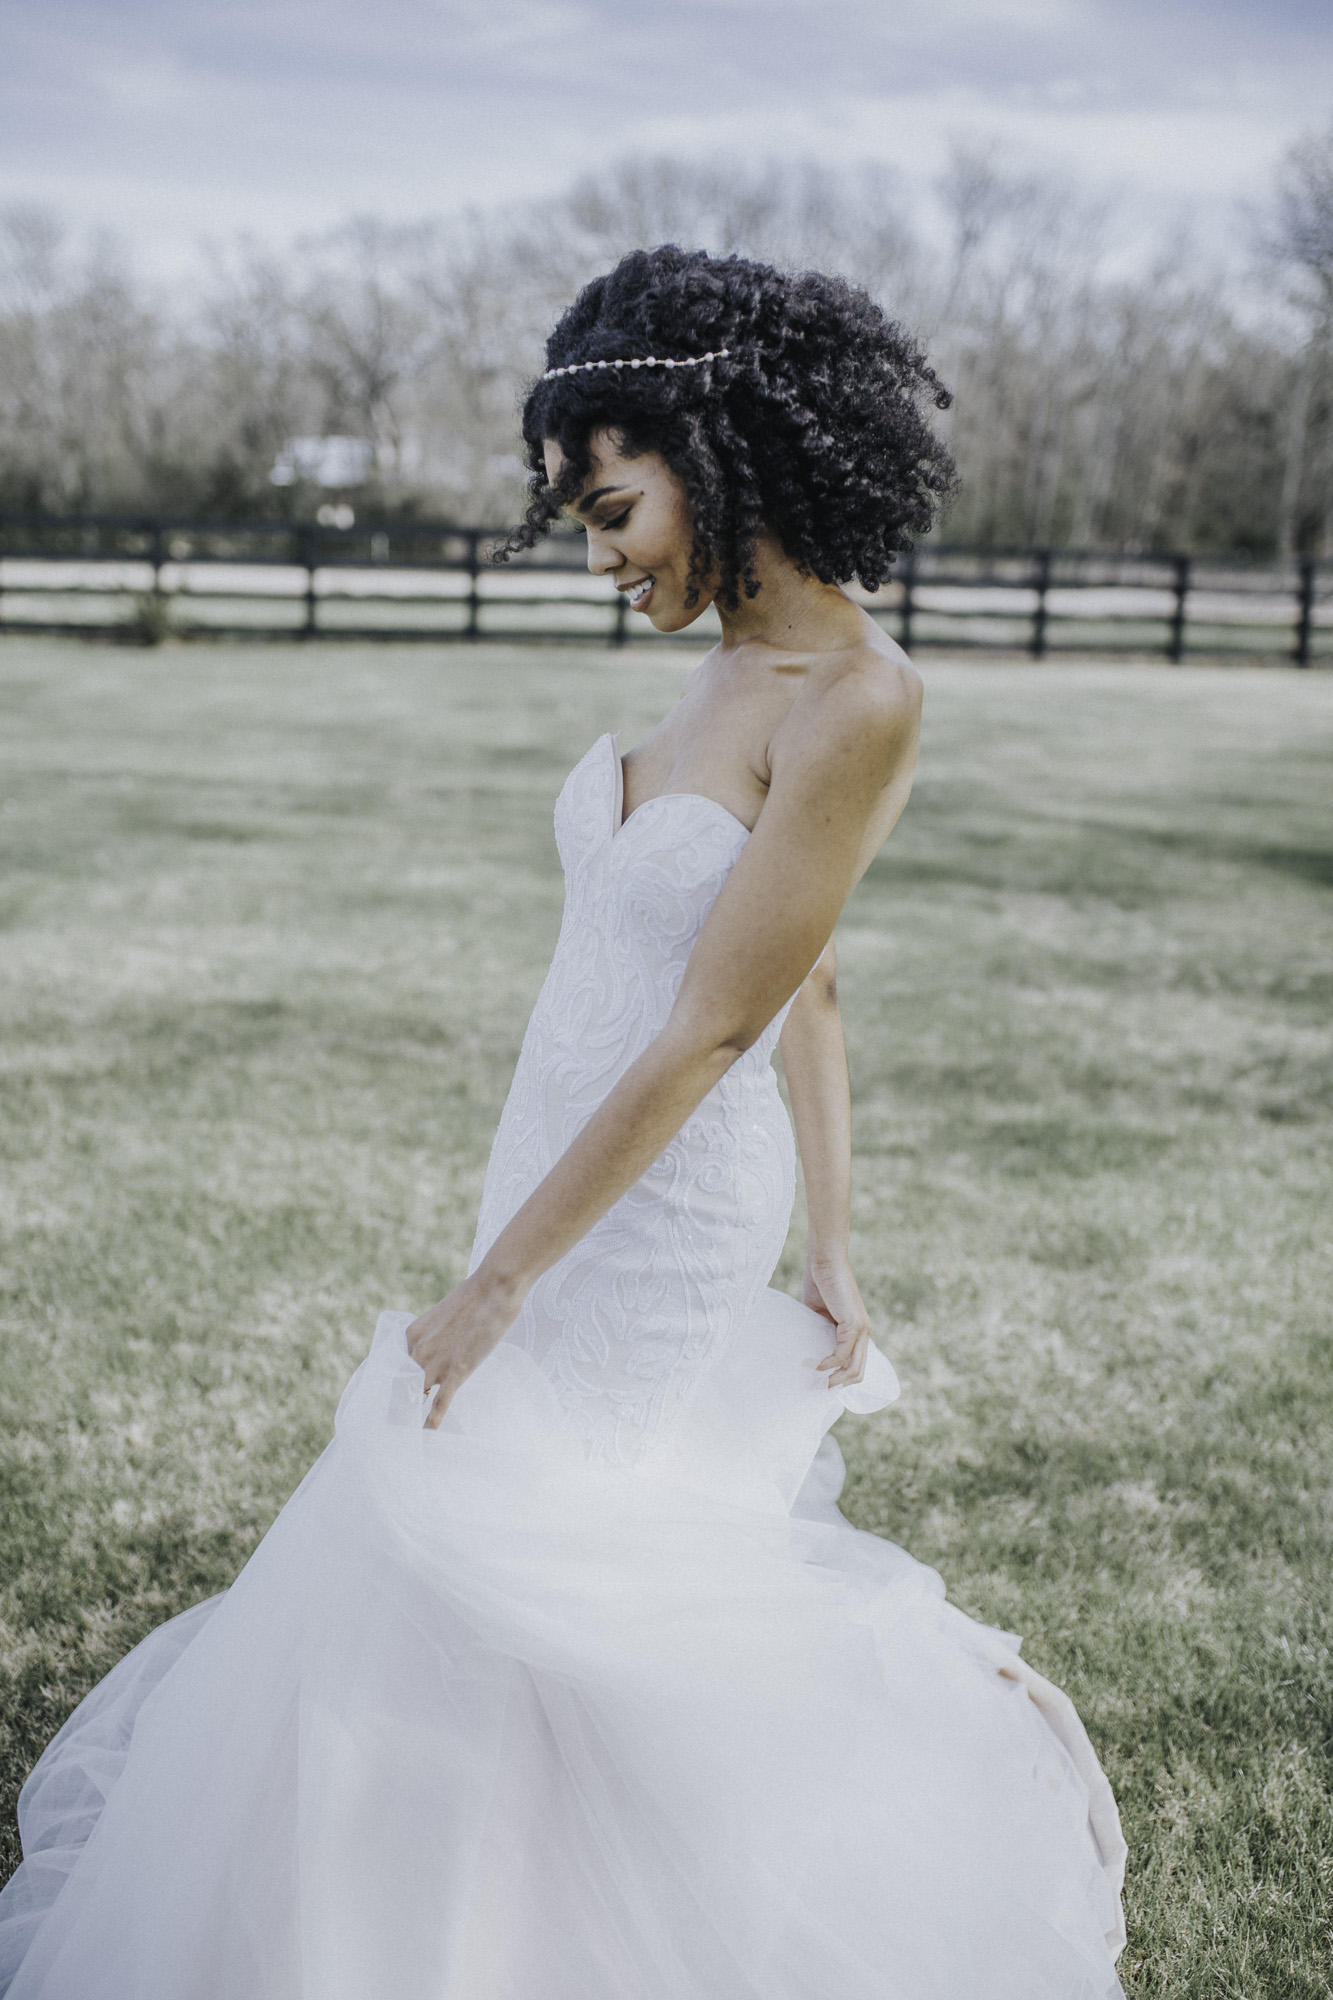 Cate_Ann_Photography_Dayton_Ohio_Wedding_Elopement_And_Engagement_PhotographerIMG_8321.jpg